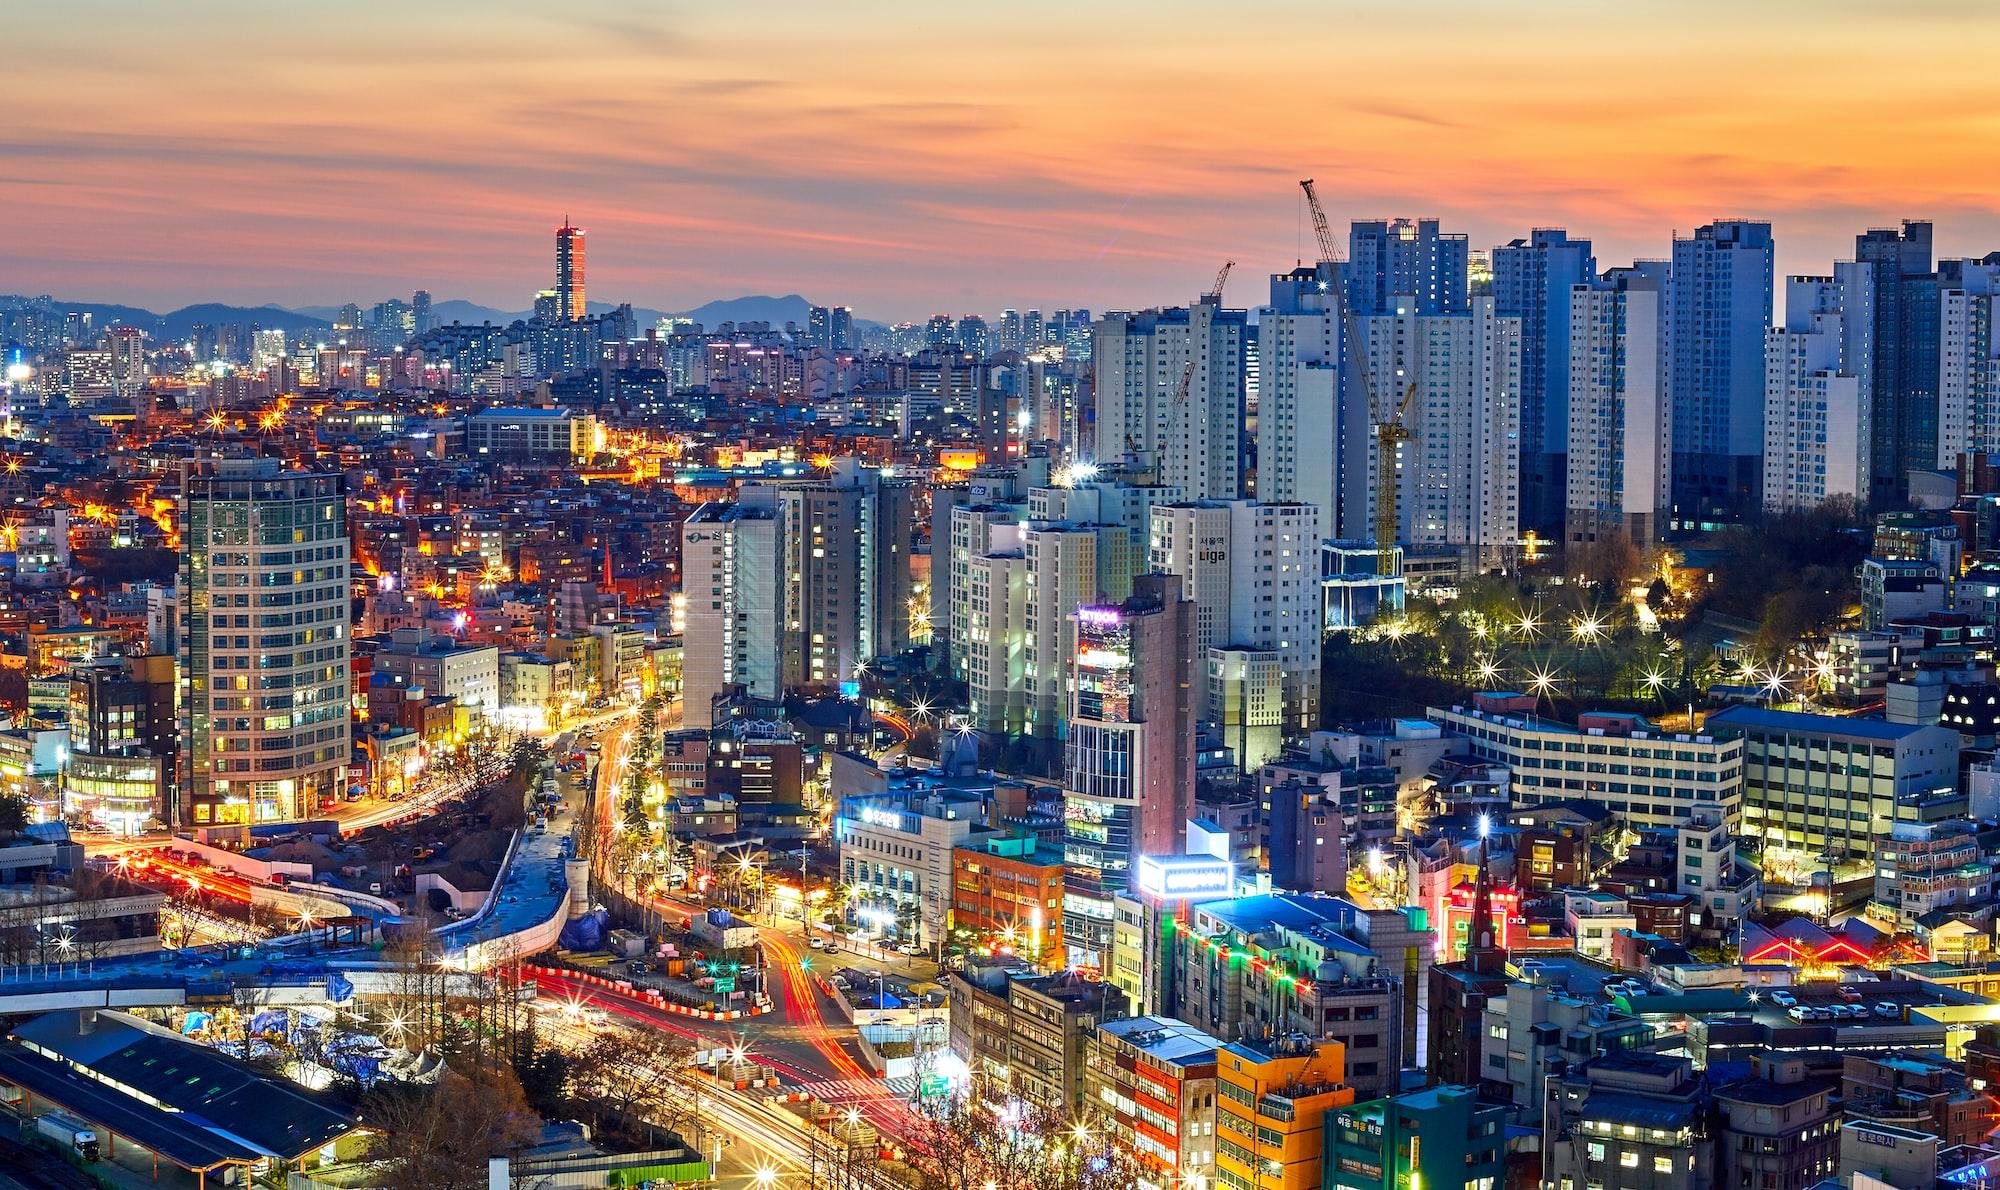 Cityscape in seoul south korea around sunset.